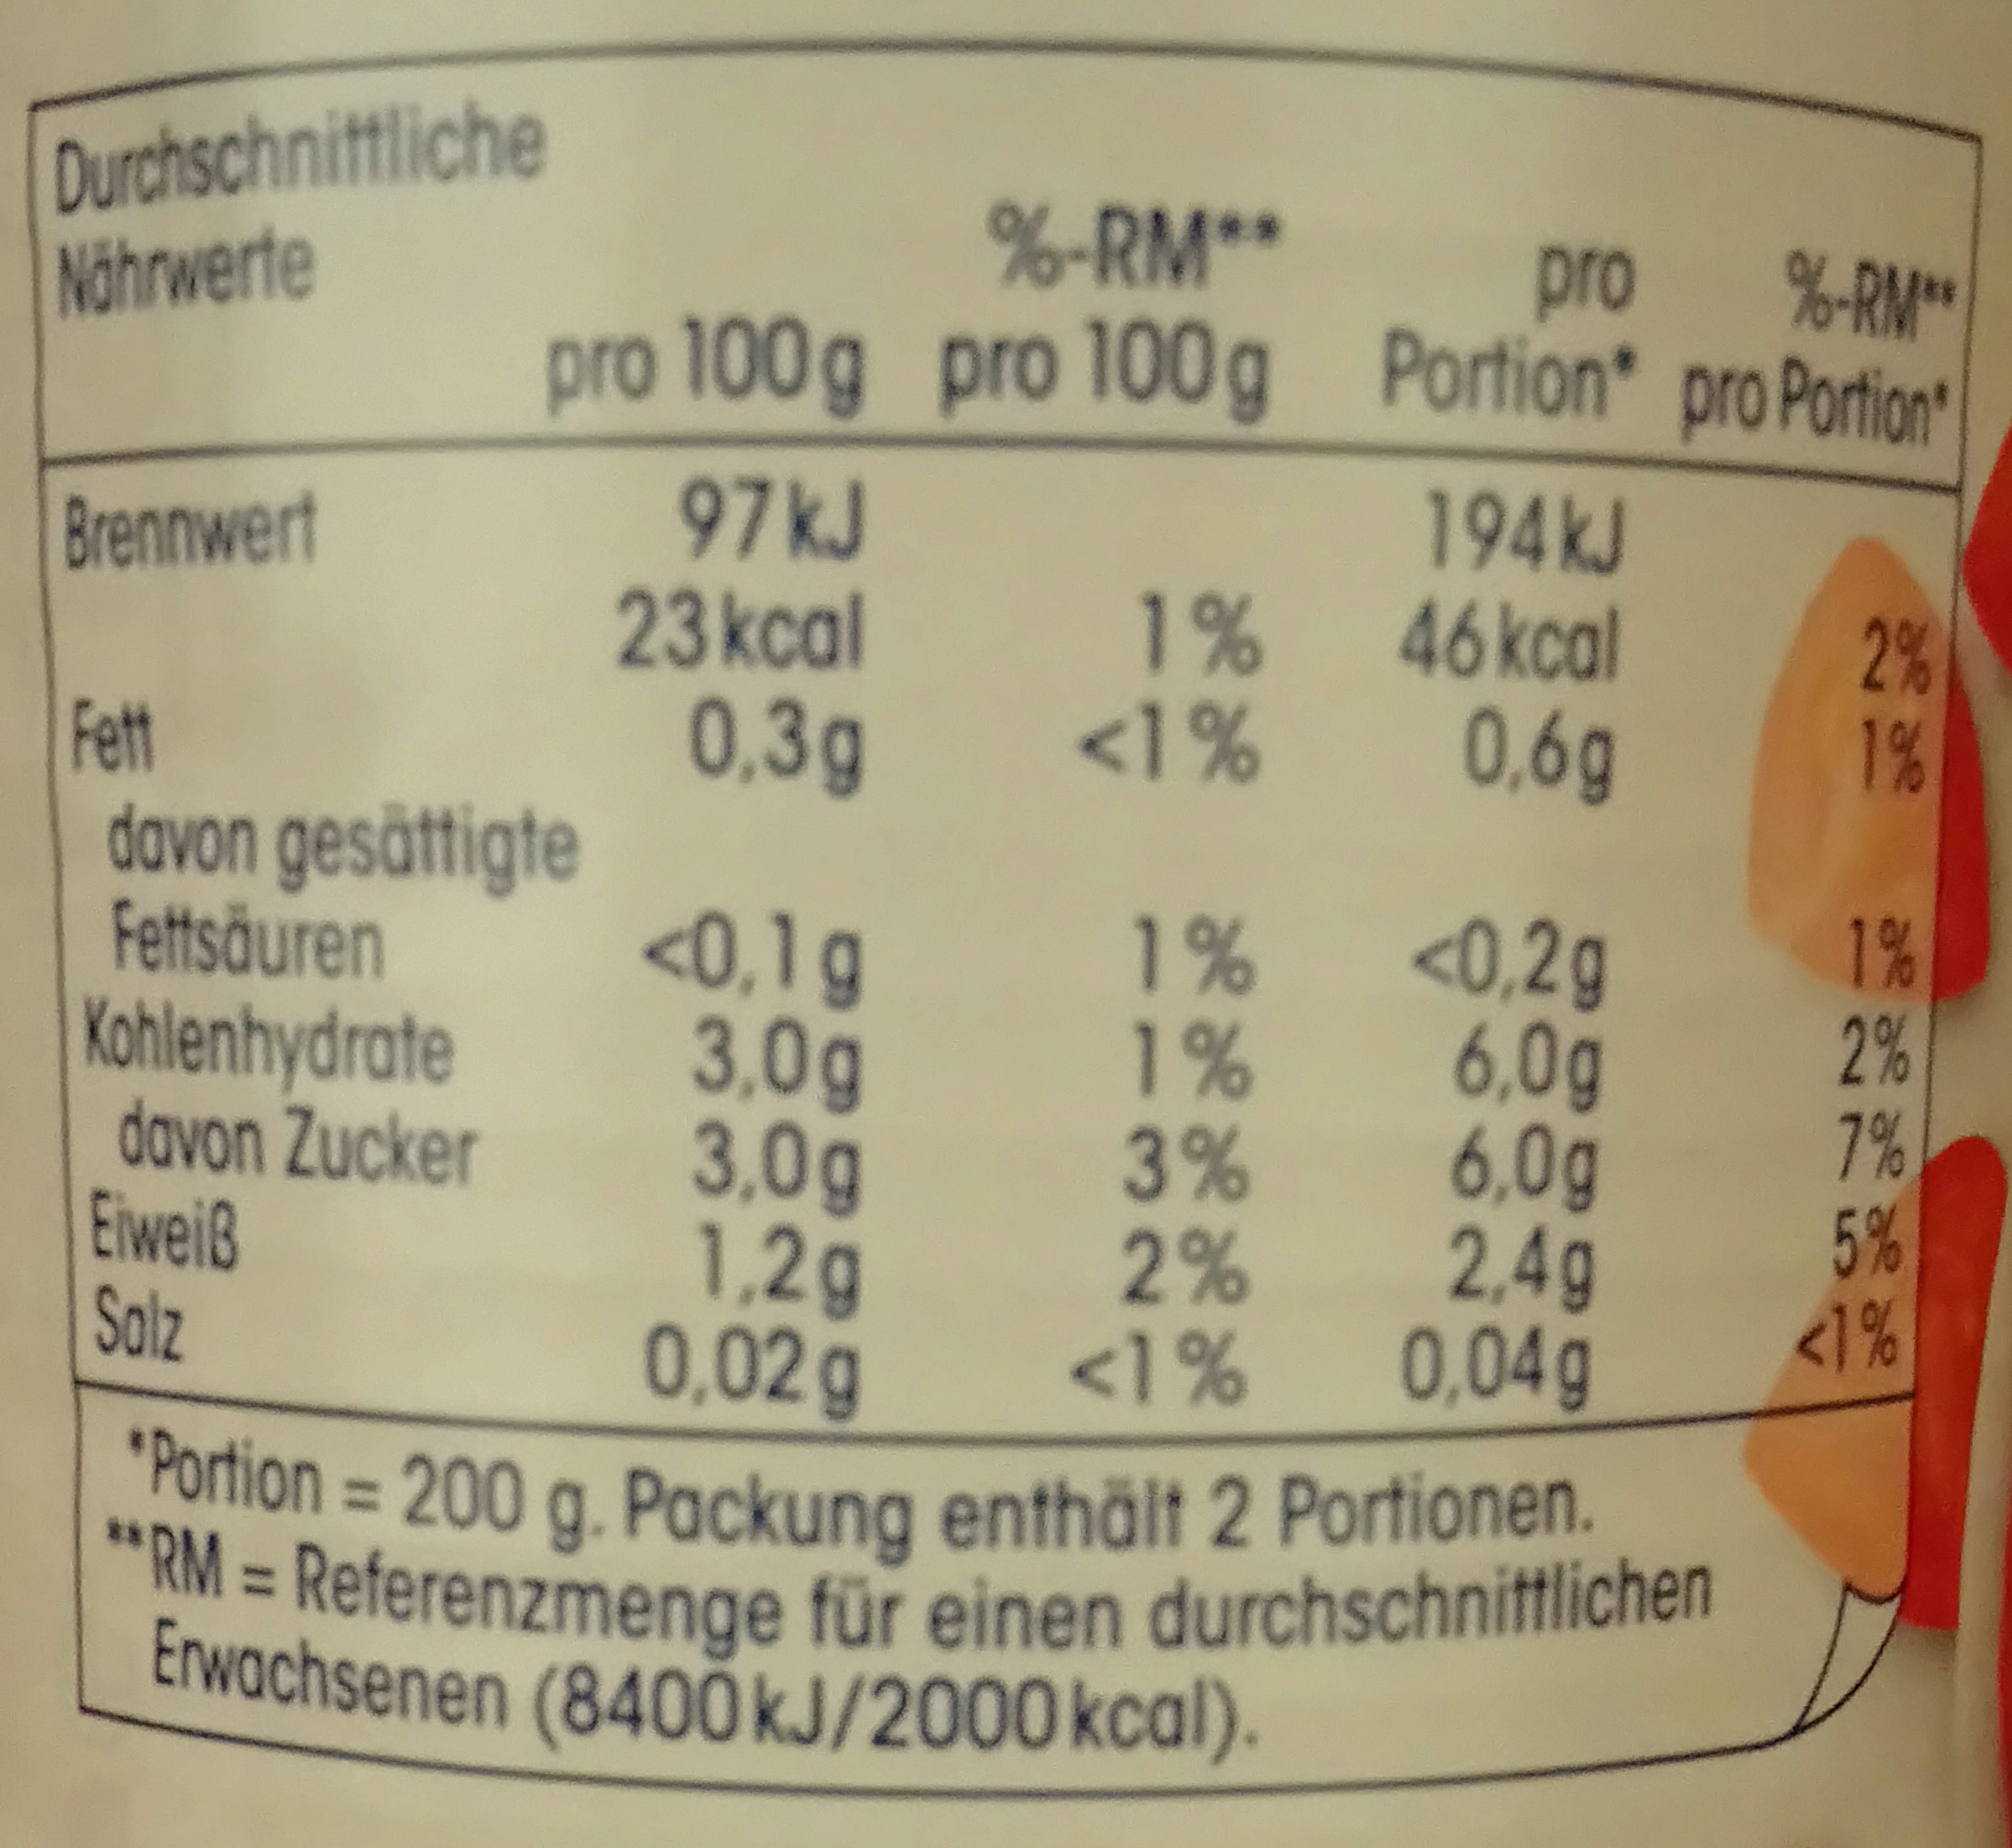 Fein gehackte Tomaten in Tomatensaft - Informations nutritionnelles - de